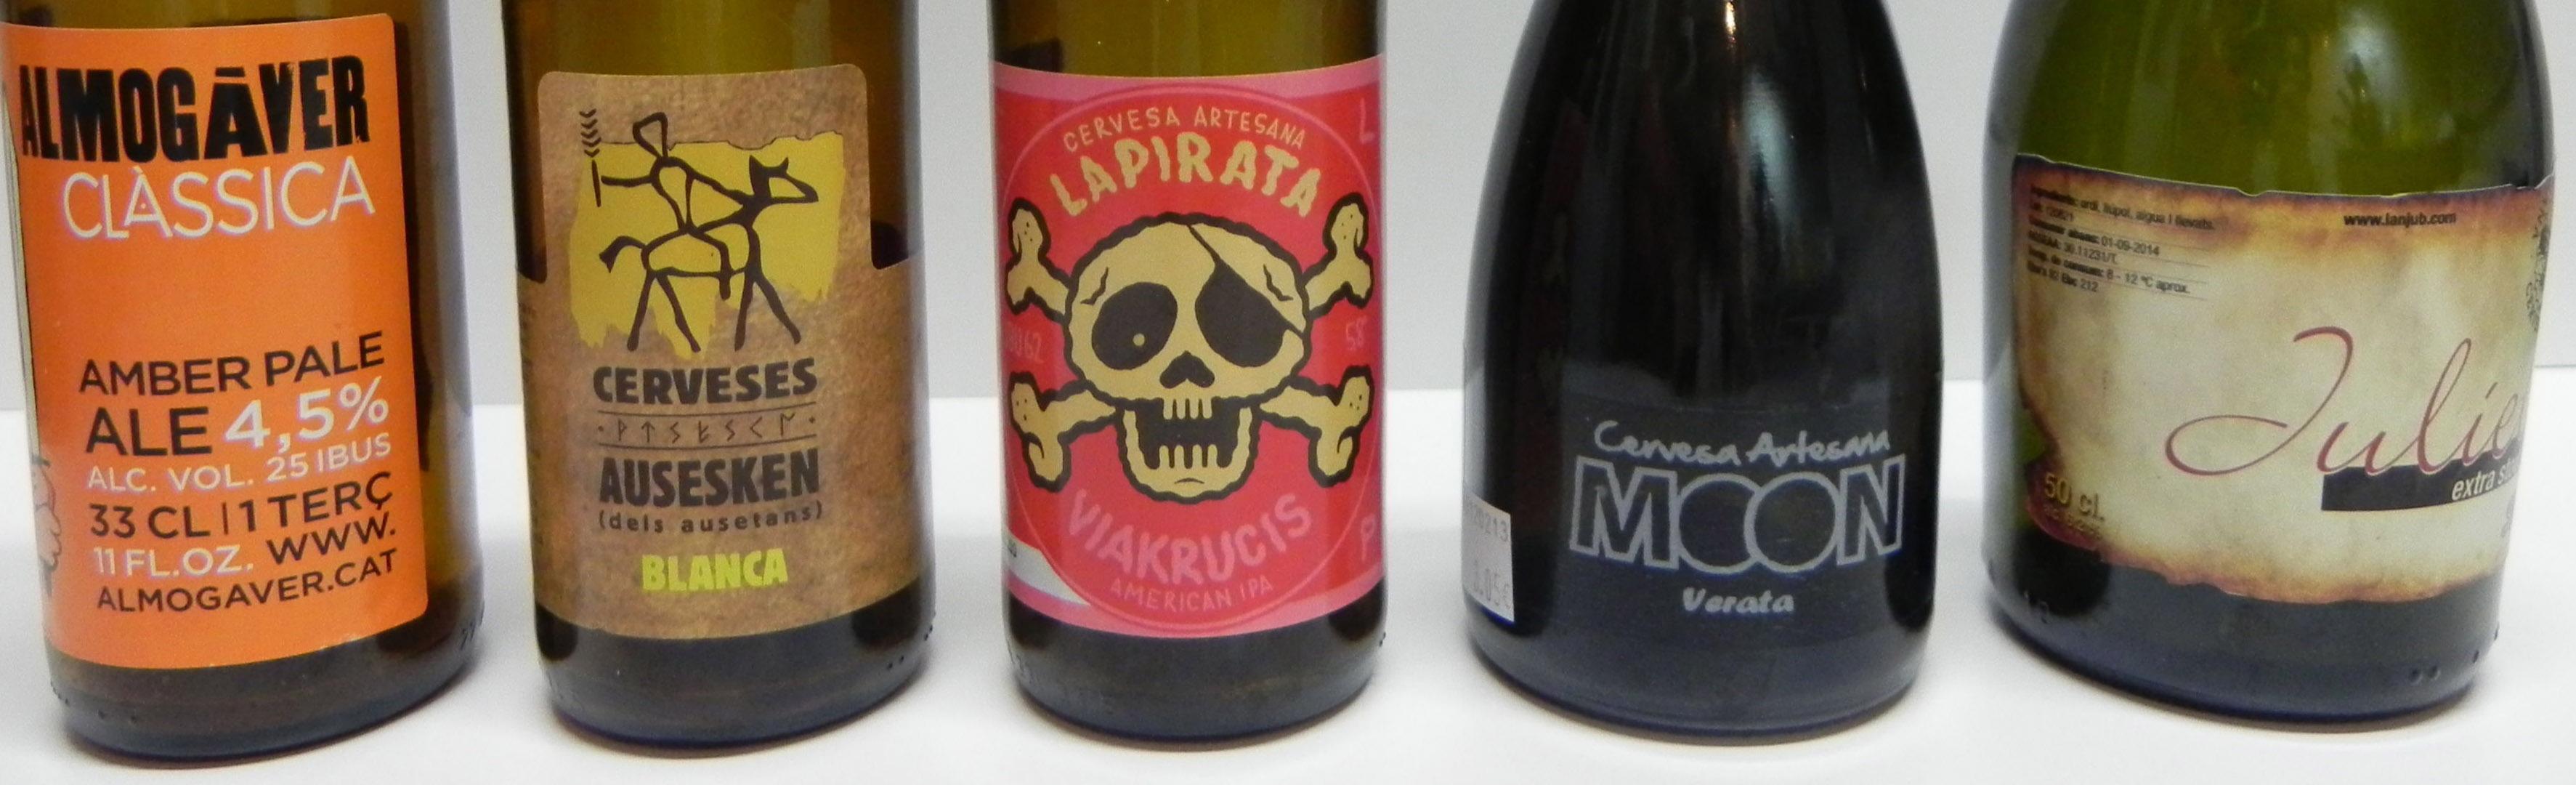 cerveses catalanes 1ª cata retallada